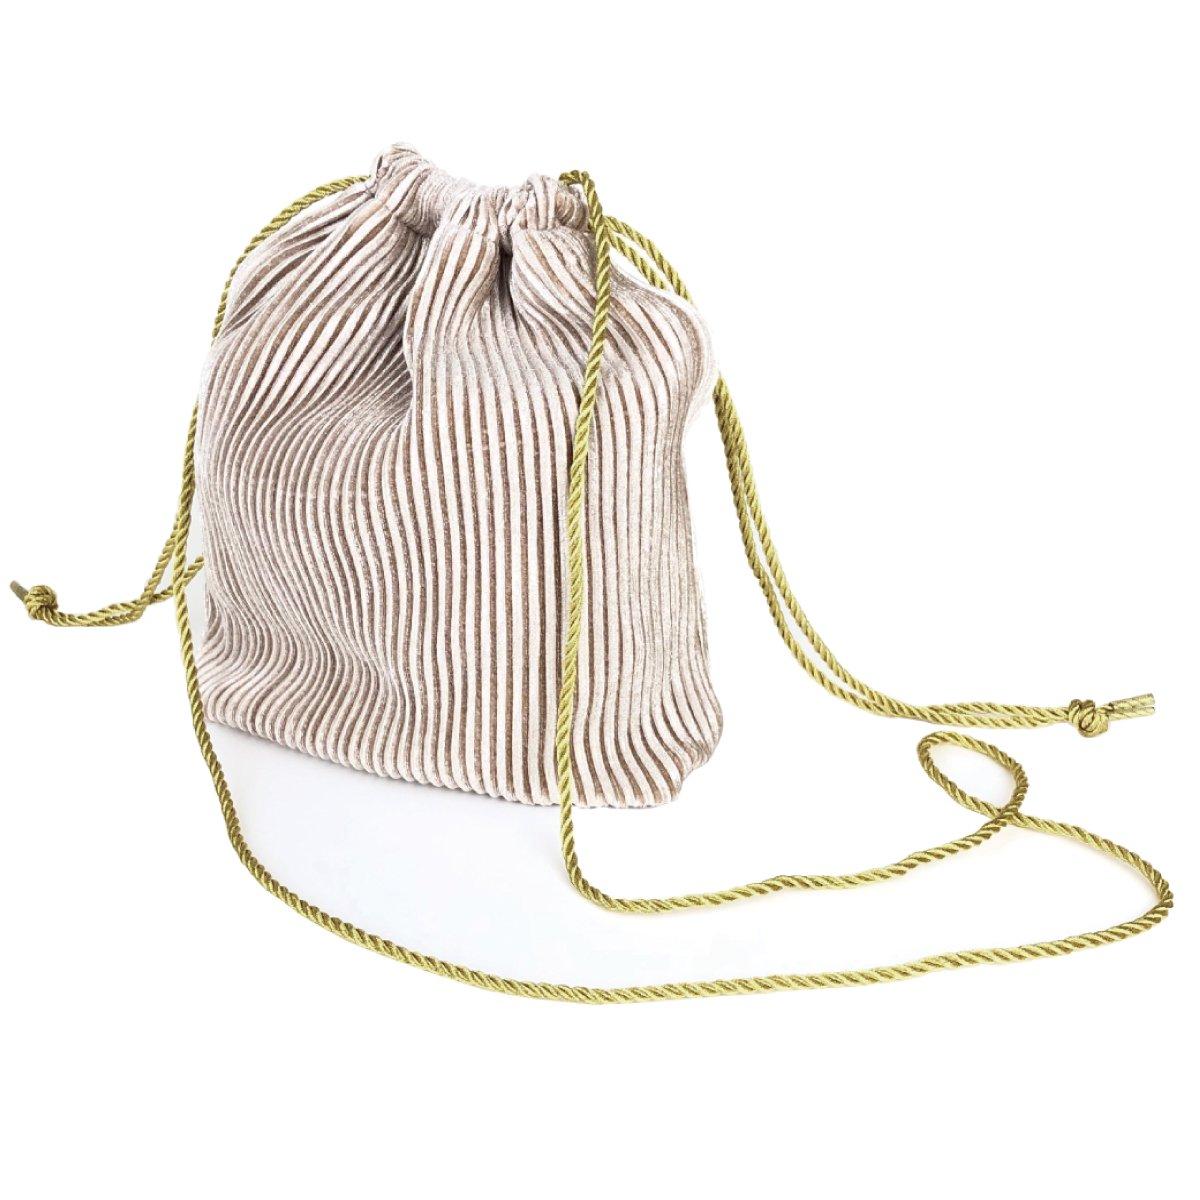 Classy Pleats Bag 詳細画像7